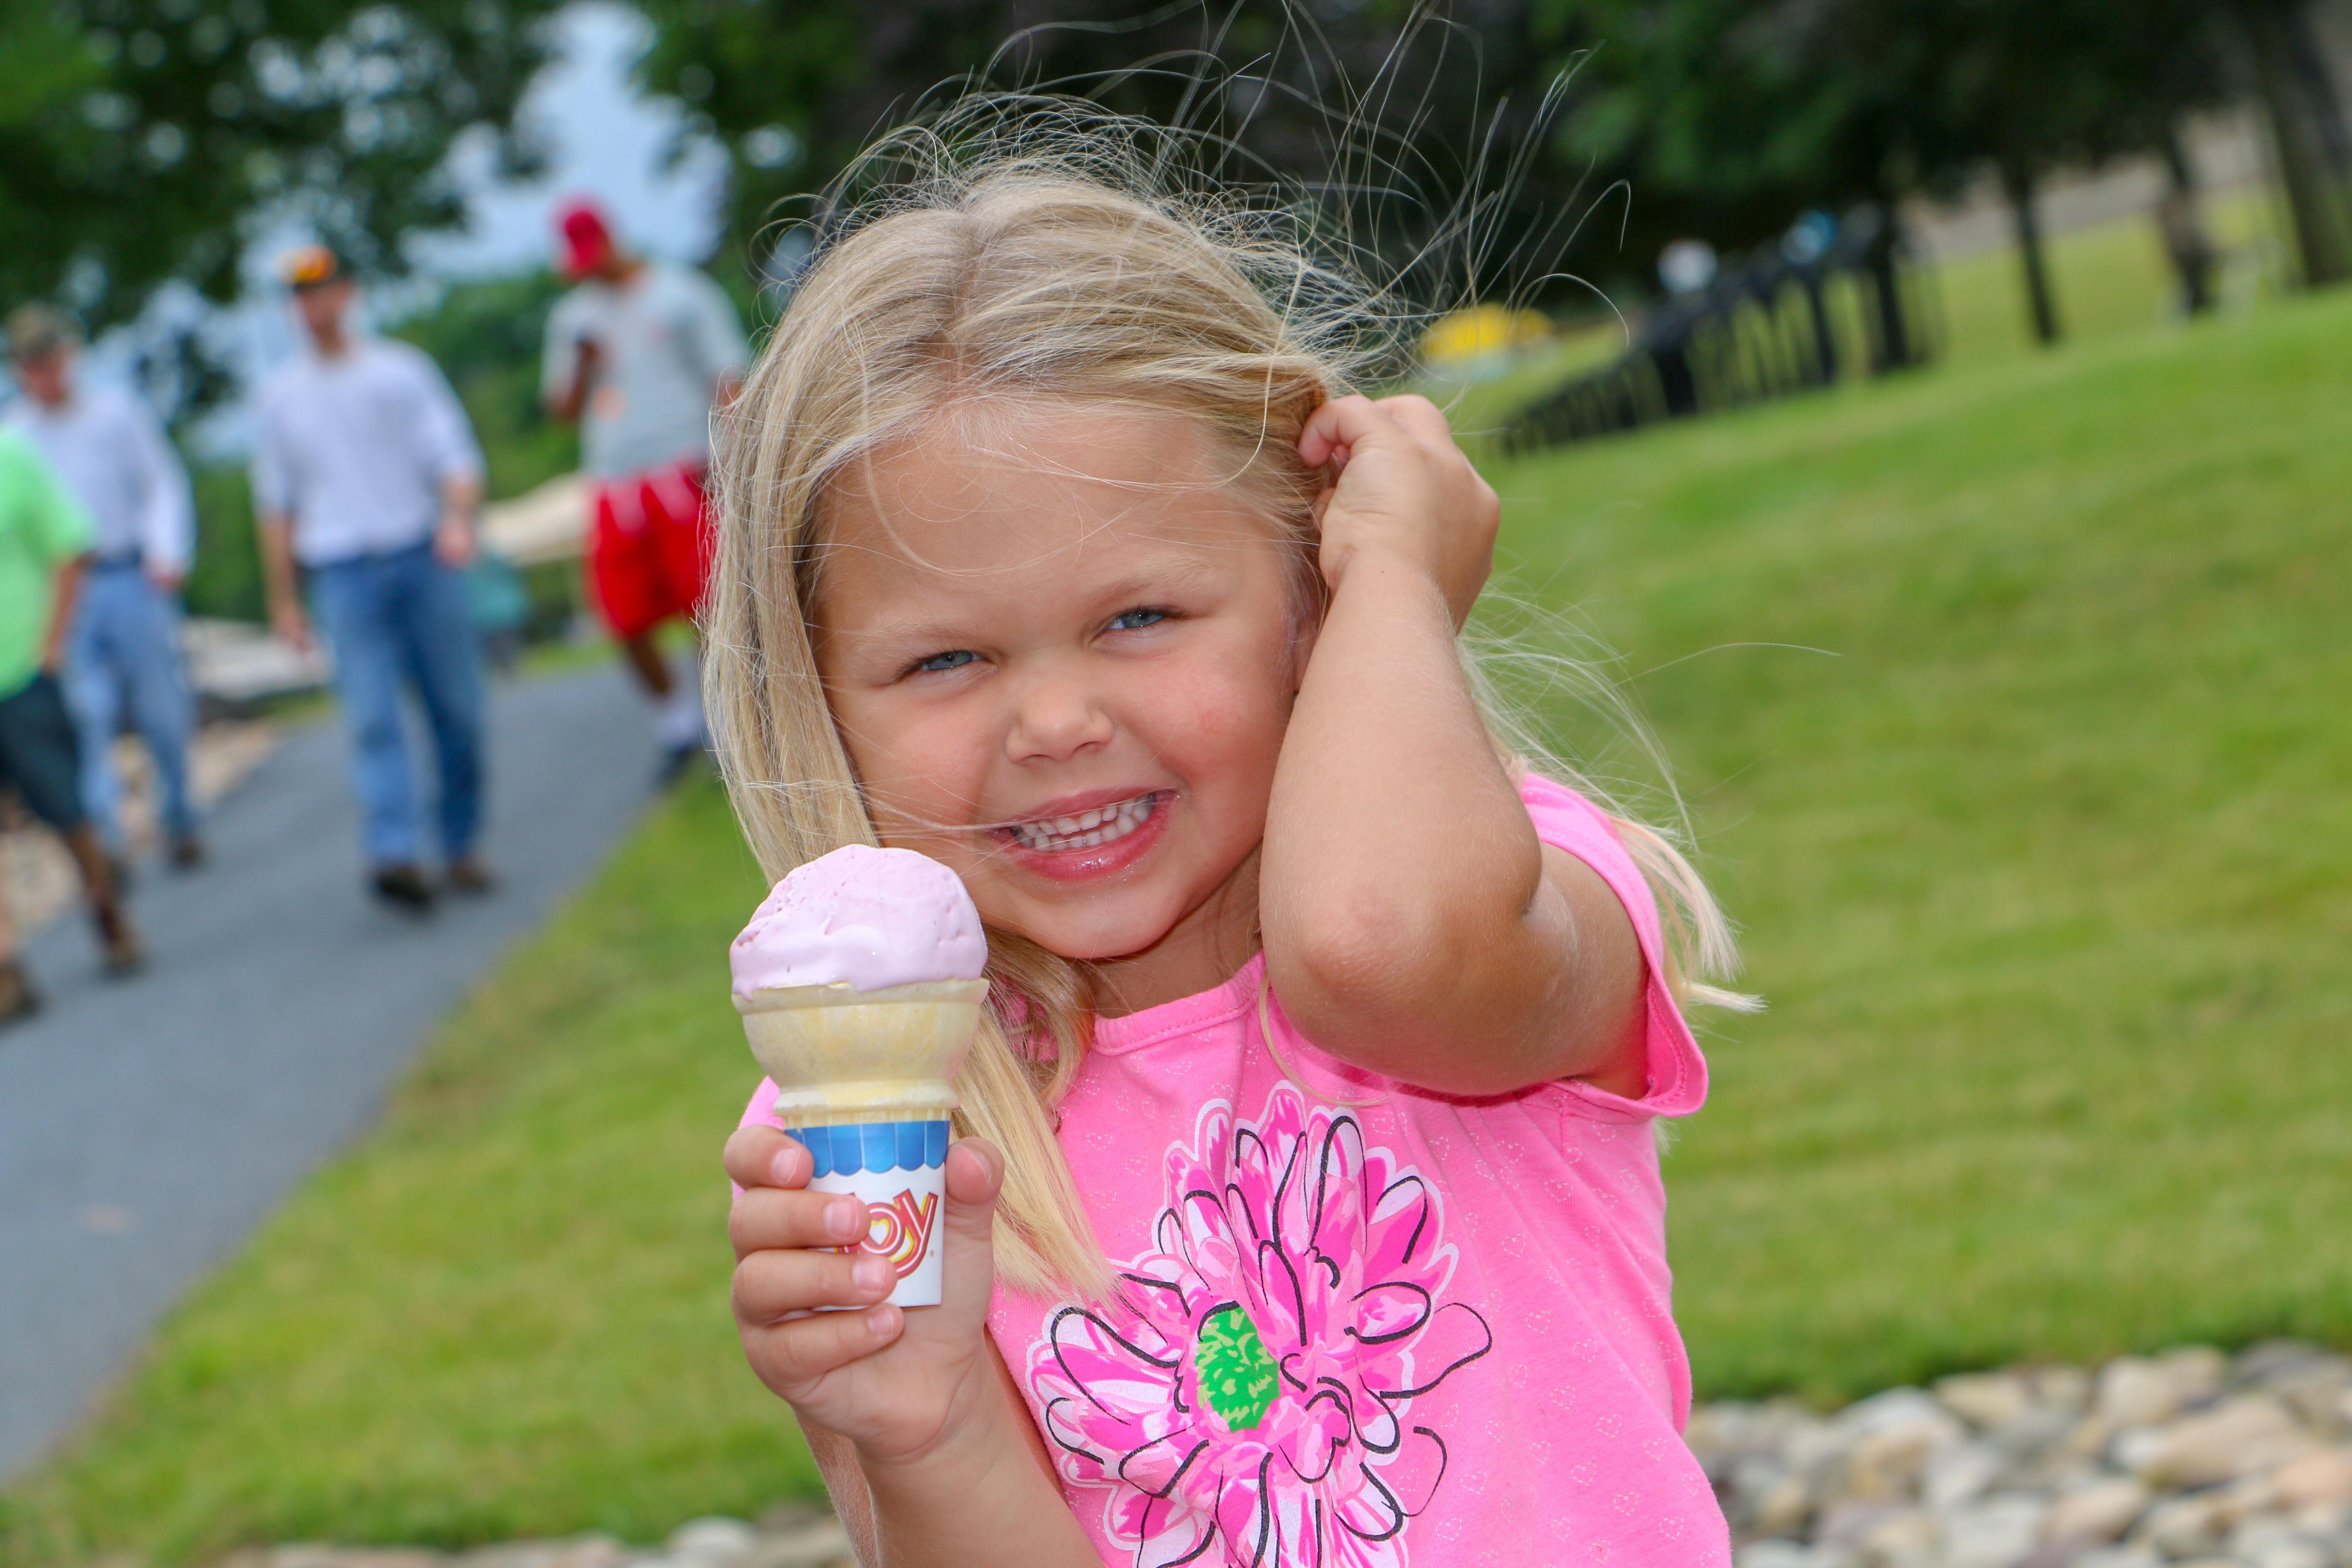 Enjoying ice cream at Spartan Ice Cream Center